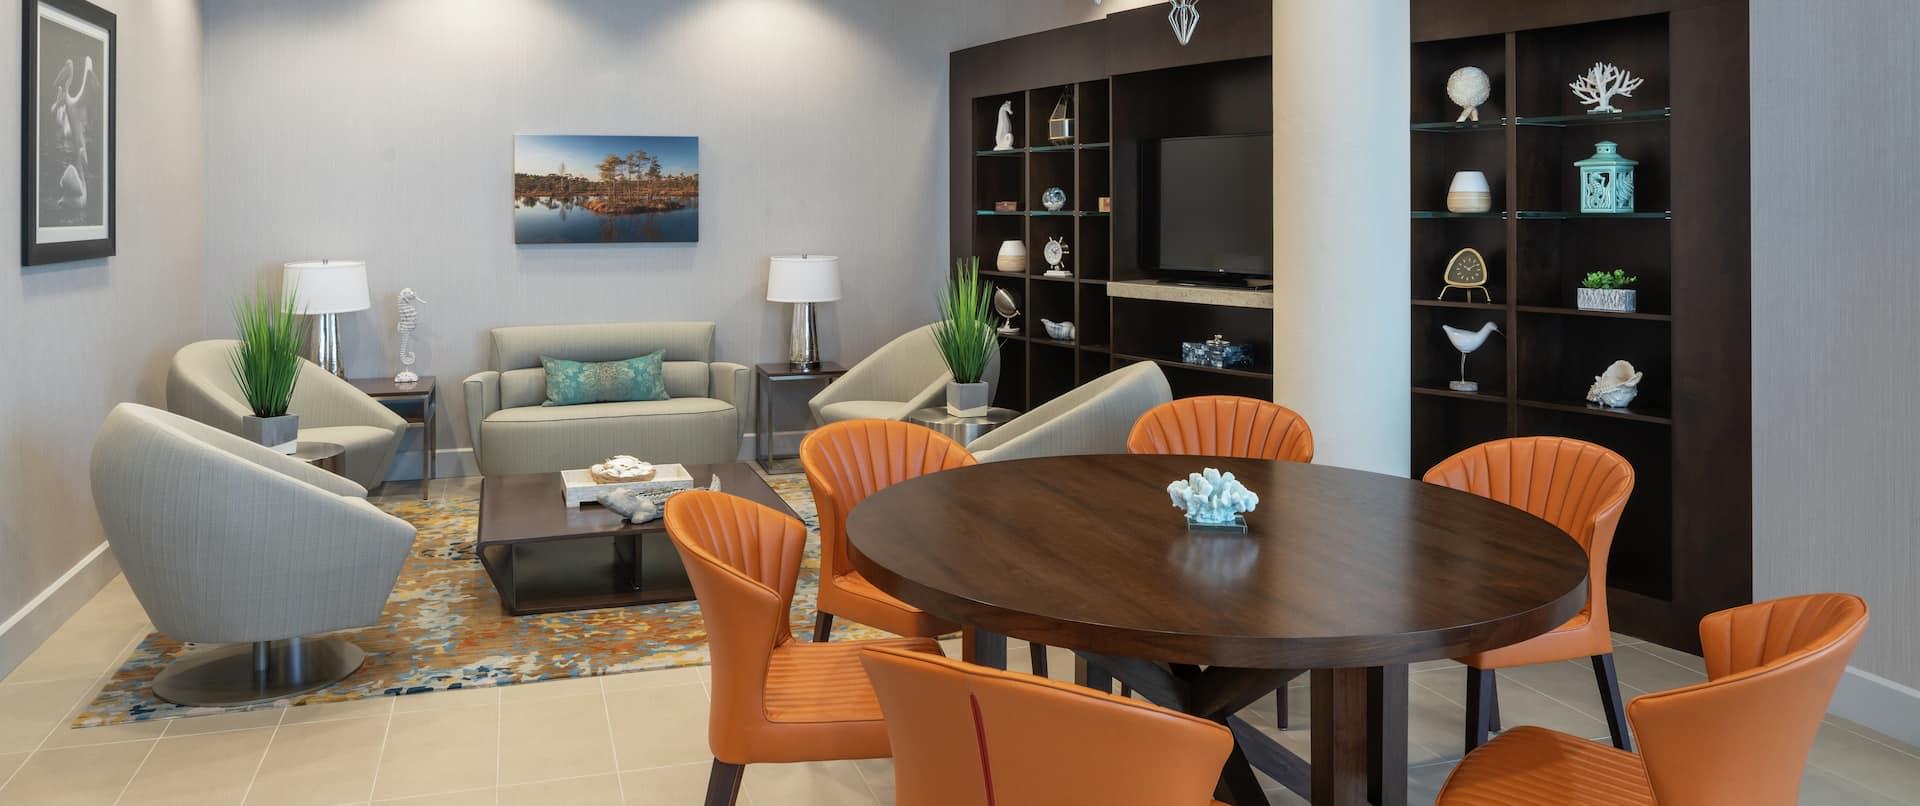 DoubleTree Multi-Purpose Room